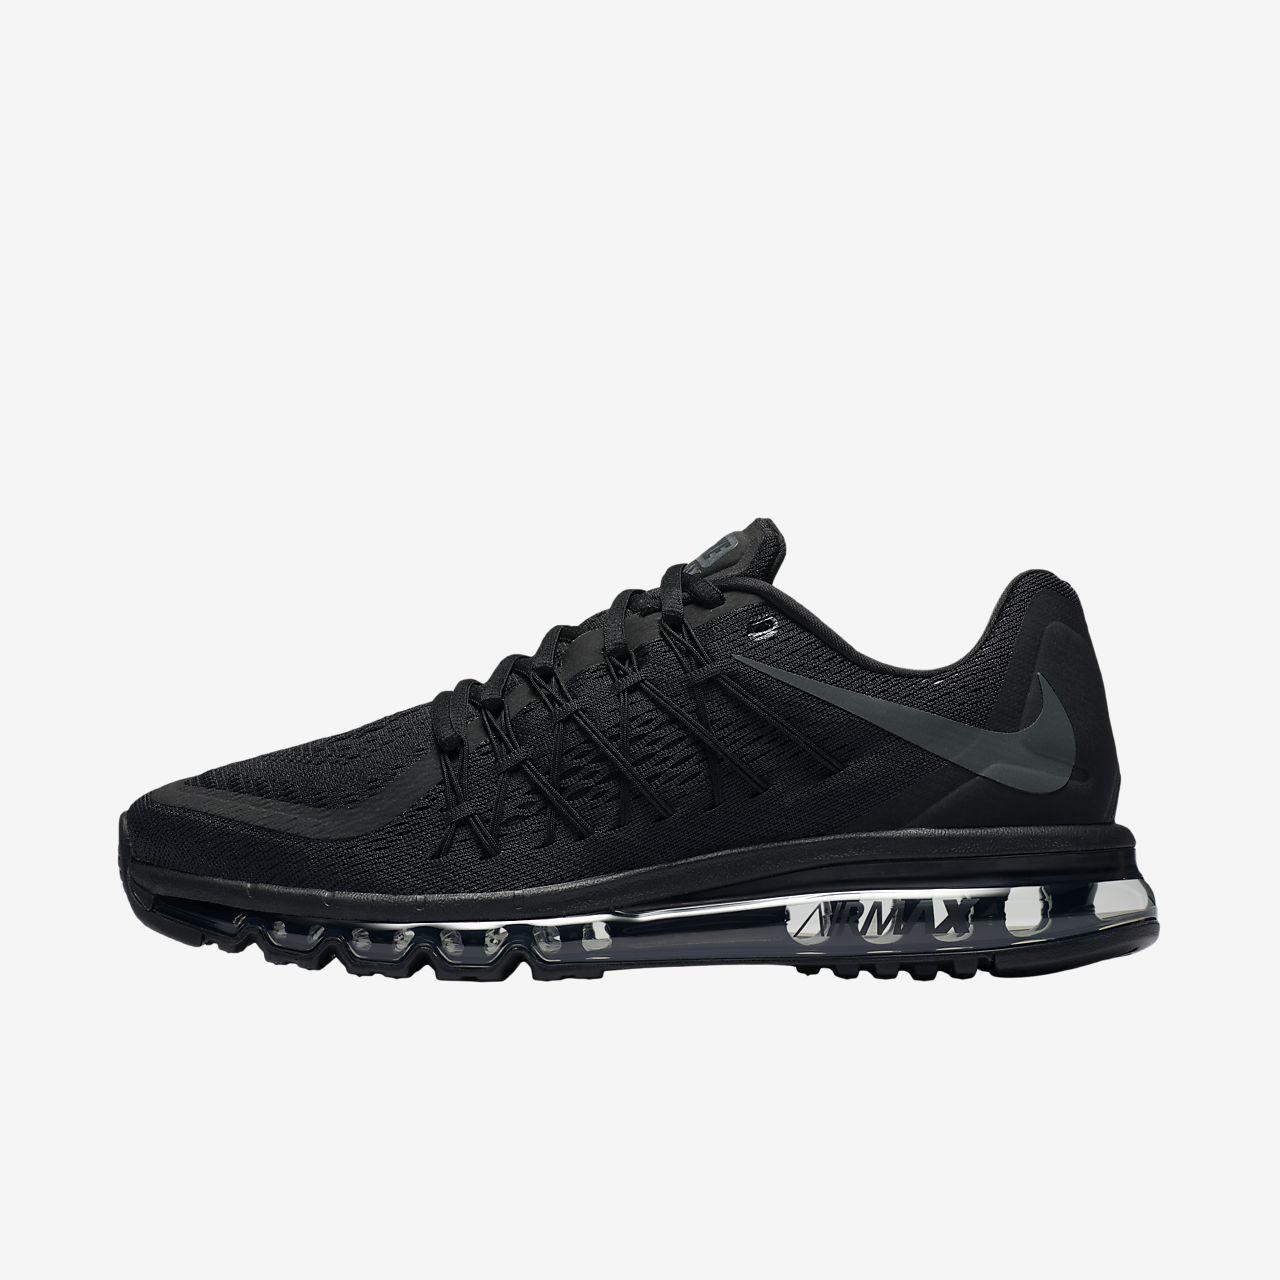 759301f2 Мужские кроссовки Nike Air Max 2015. Nike.com RU